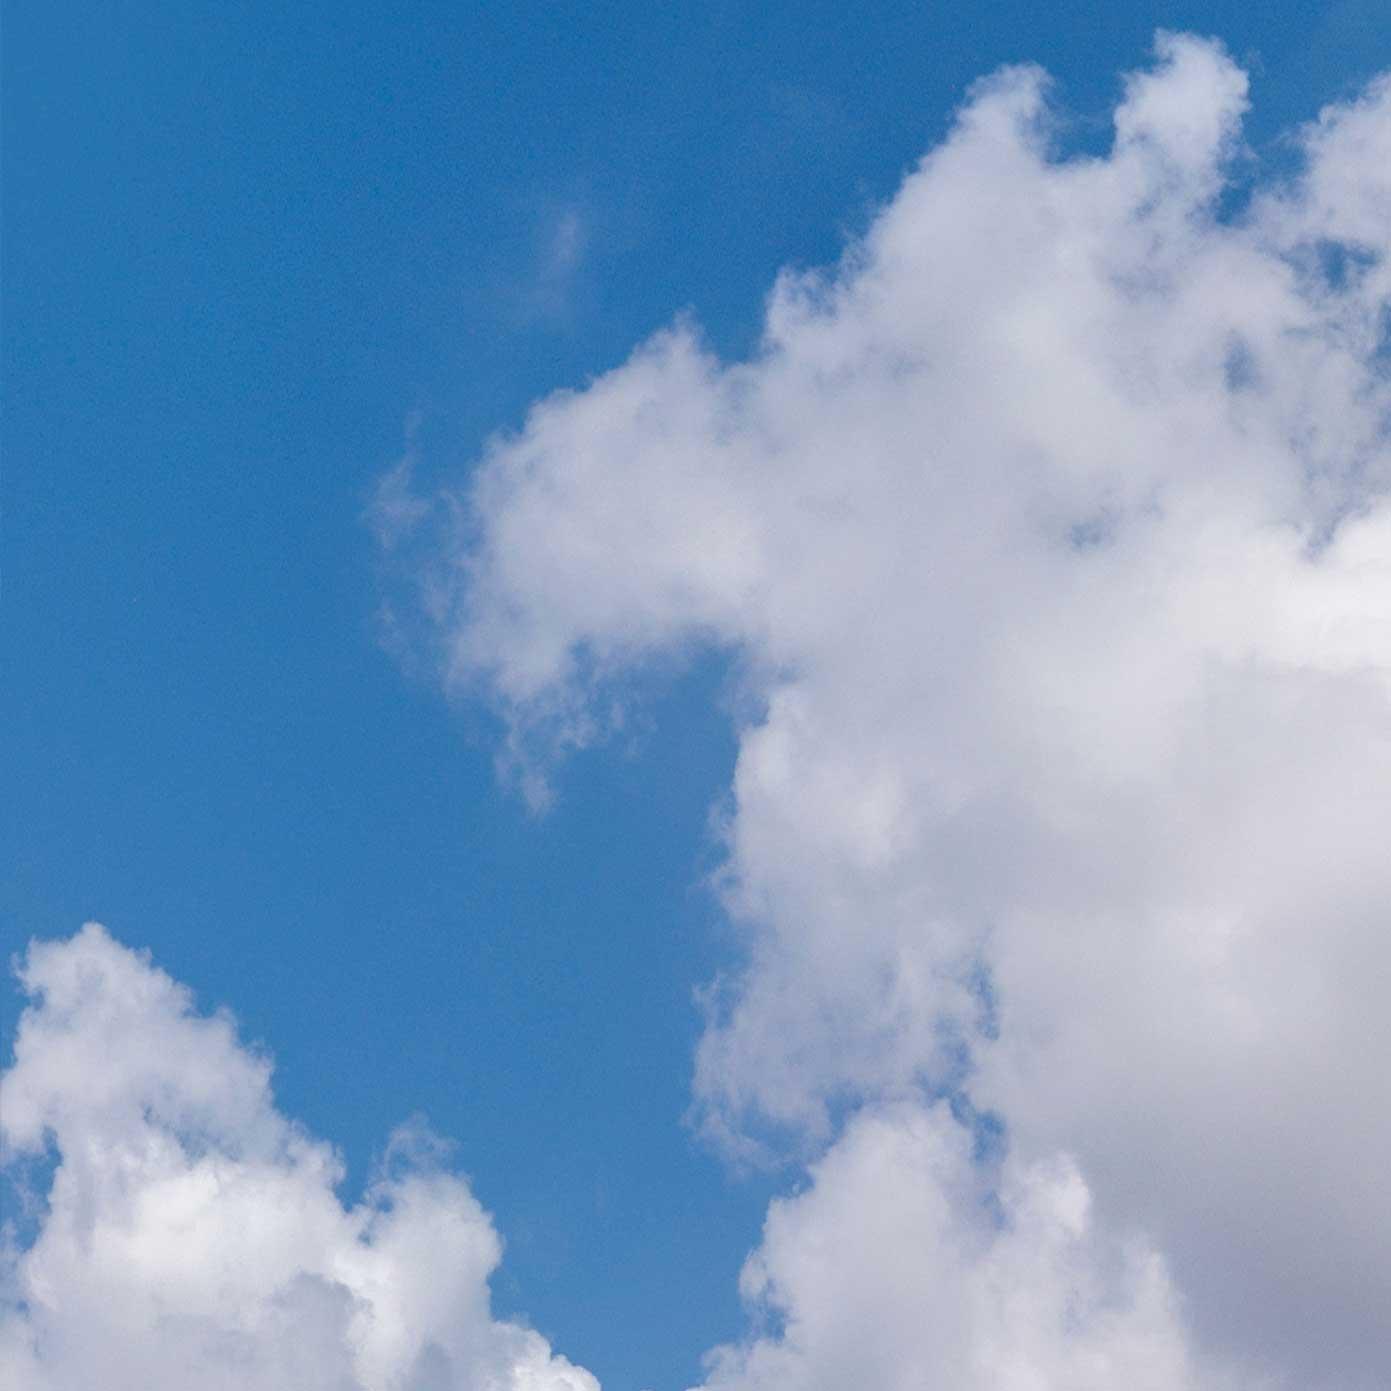 Endloser Himmel – Modellbahn Hintergrund 360° 2